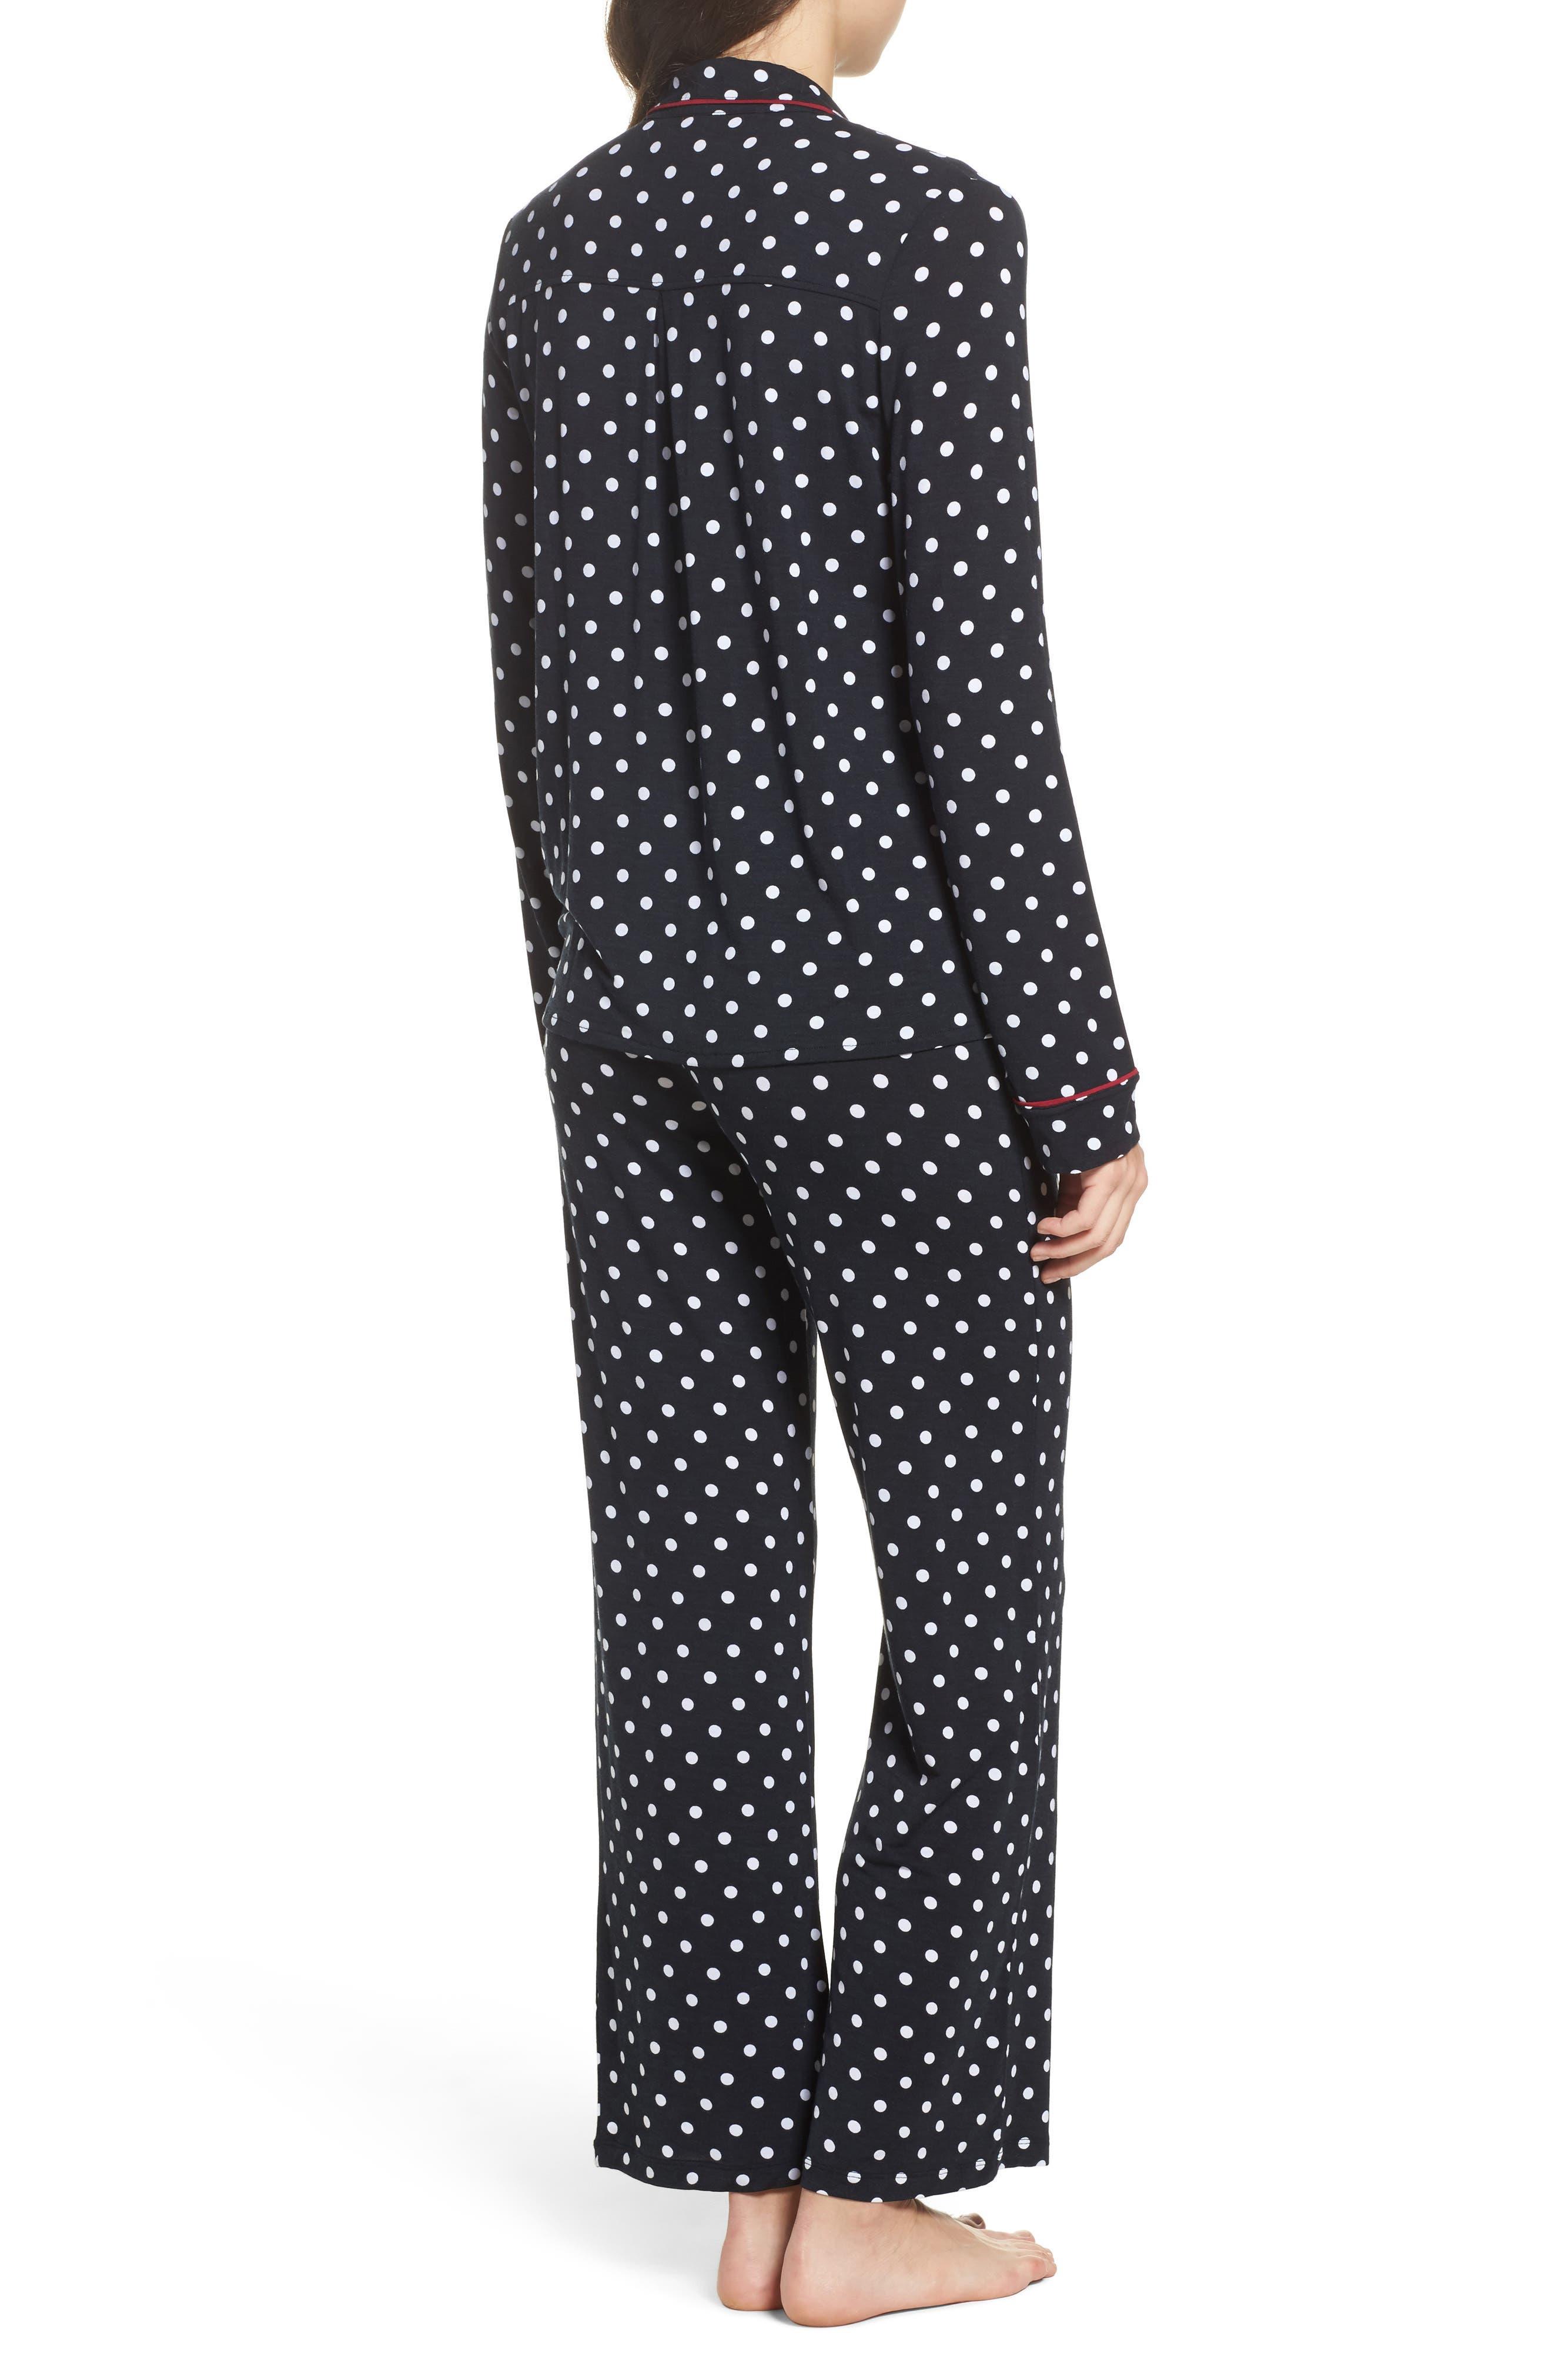 Stretch Modal Pajamas & Eye Mask,                             Alternate thumbnail 2, color,                             001